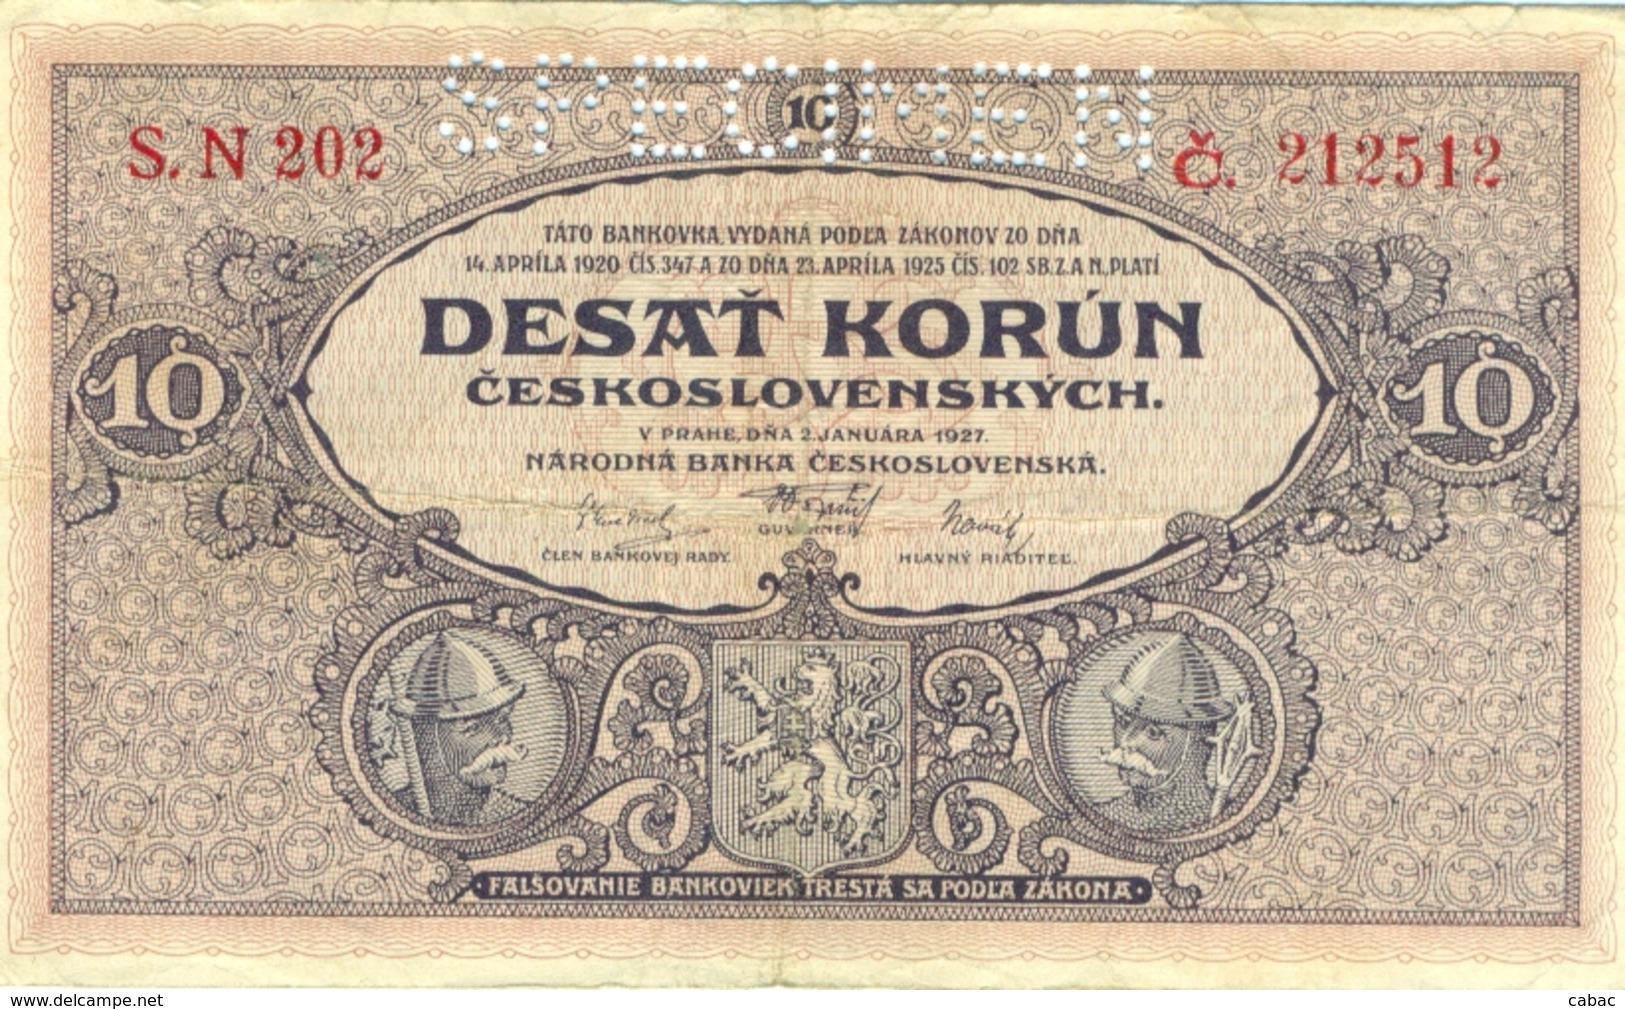 Czechoslovakia, 10 Korun, 1927, SPECIMEN,  Narodna Banka Češkoslovenska, Desat Korun, Zehn Kronen - Tchécoslovaquie